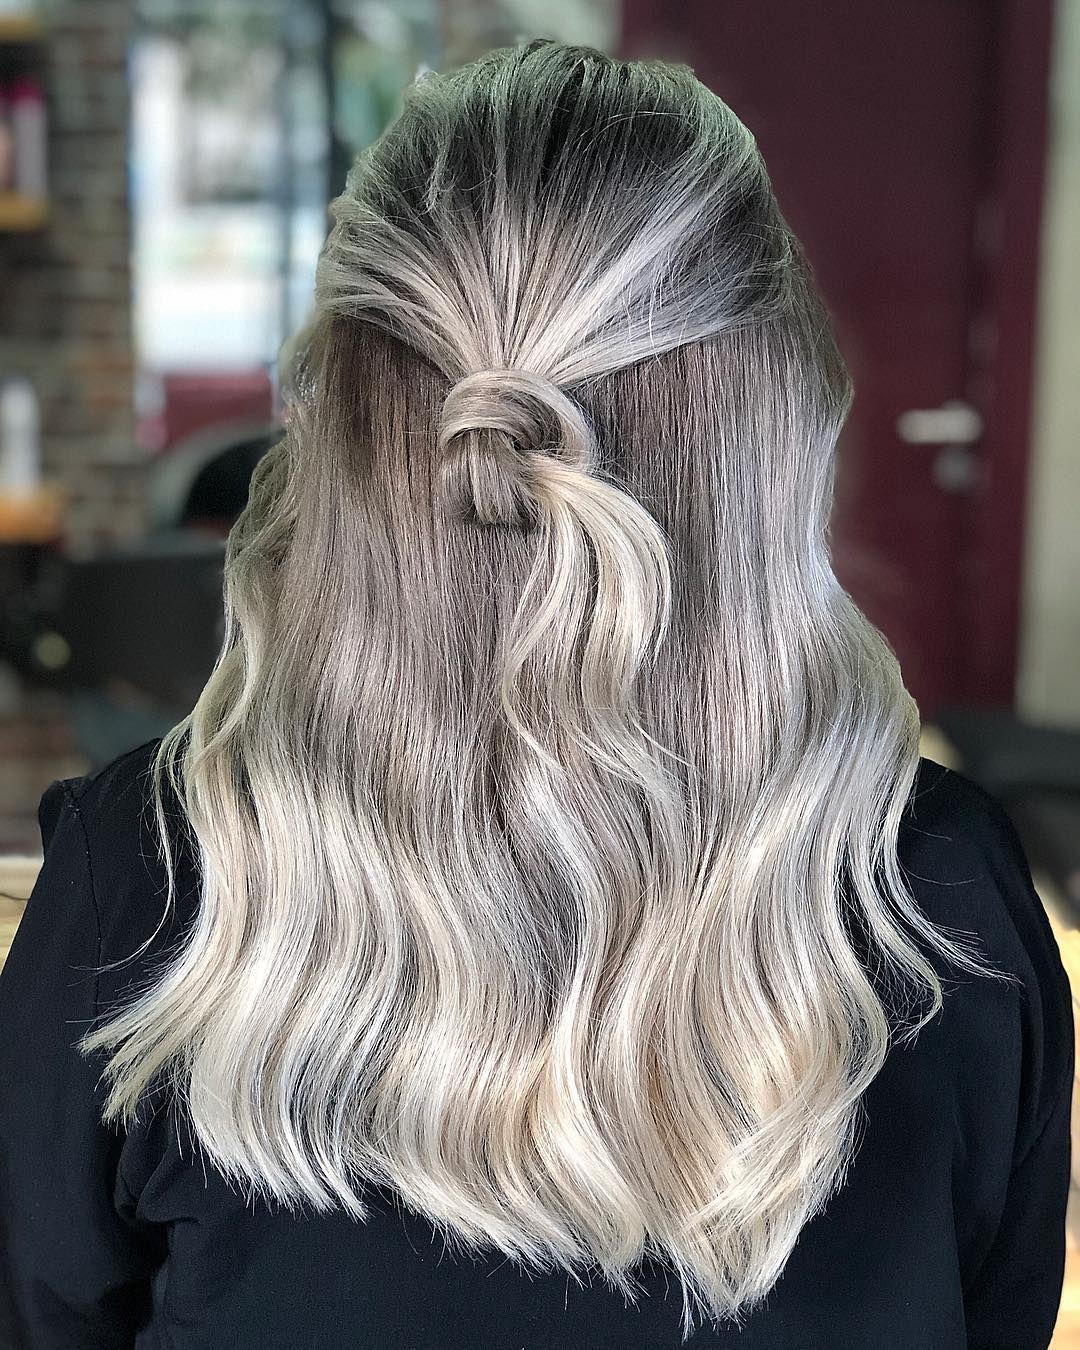 Kullu Sari Platin Sac Ombre Balyaj Brushlight Hair Kullu Sari